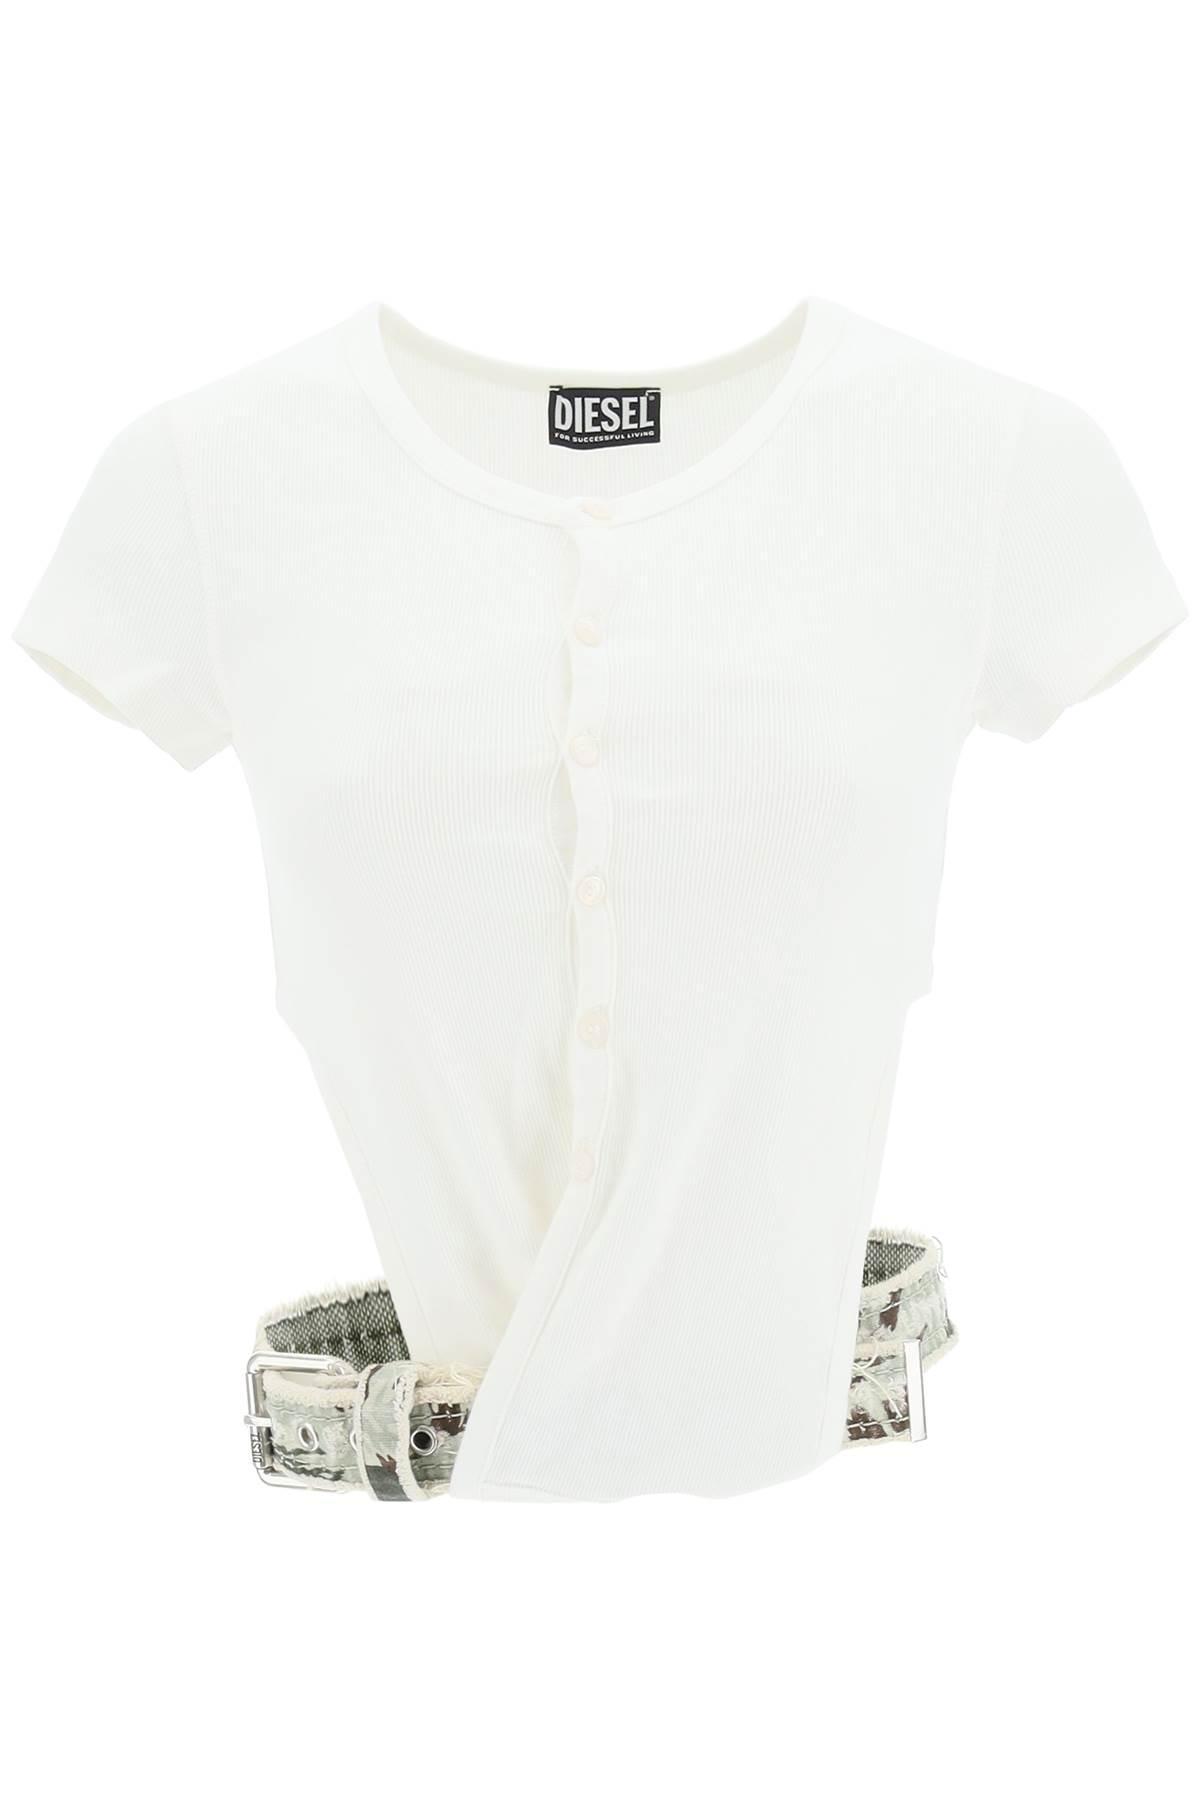 diesel top fashion show con cintura s bianco, khaki cotone